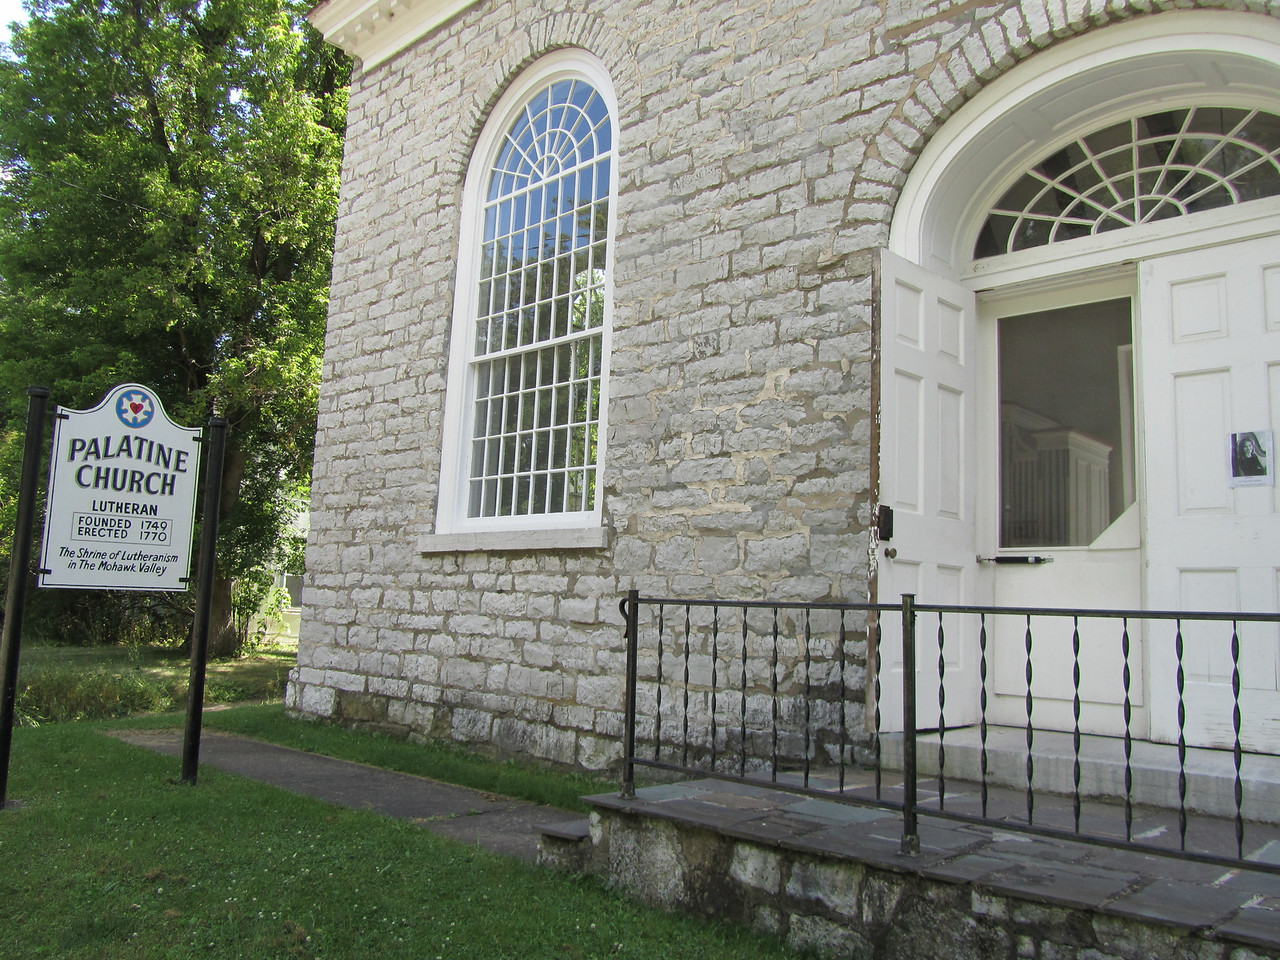 Palatine church of 1770.